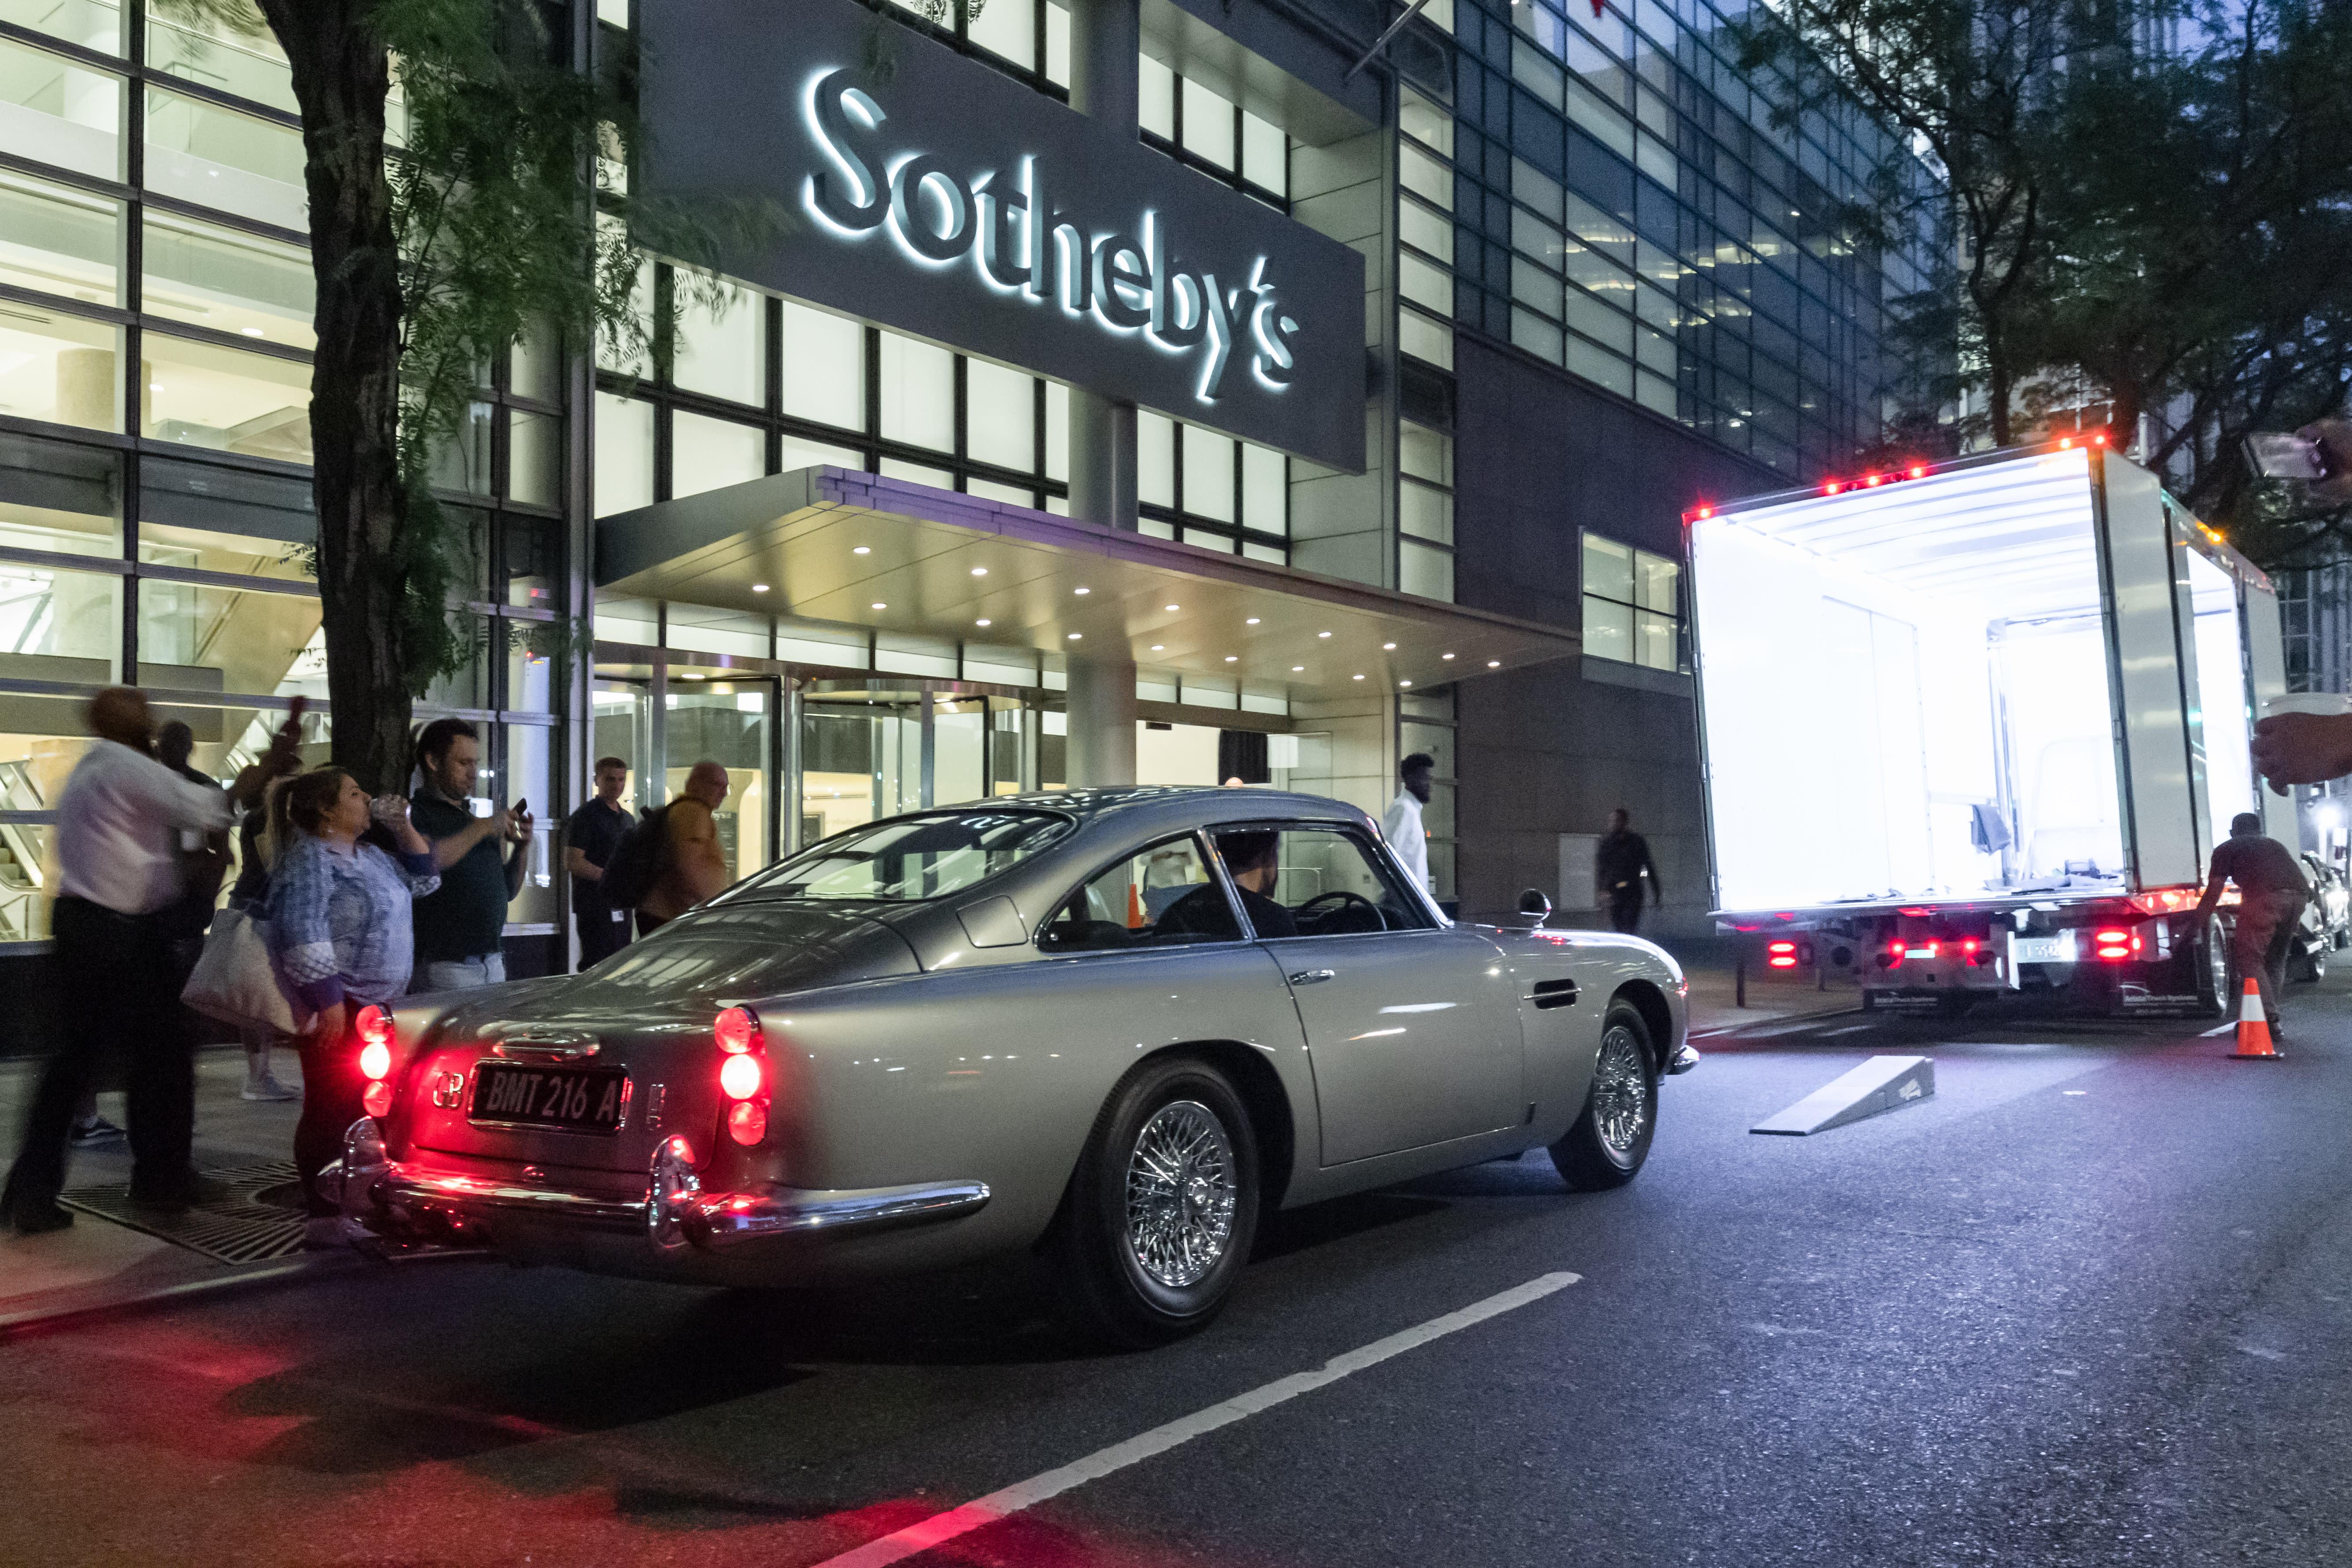 James Bond Aston Martin DB5 Is Headed to Auction